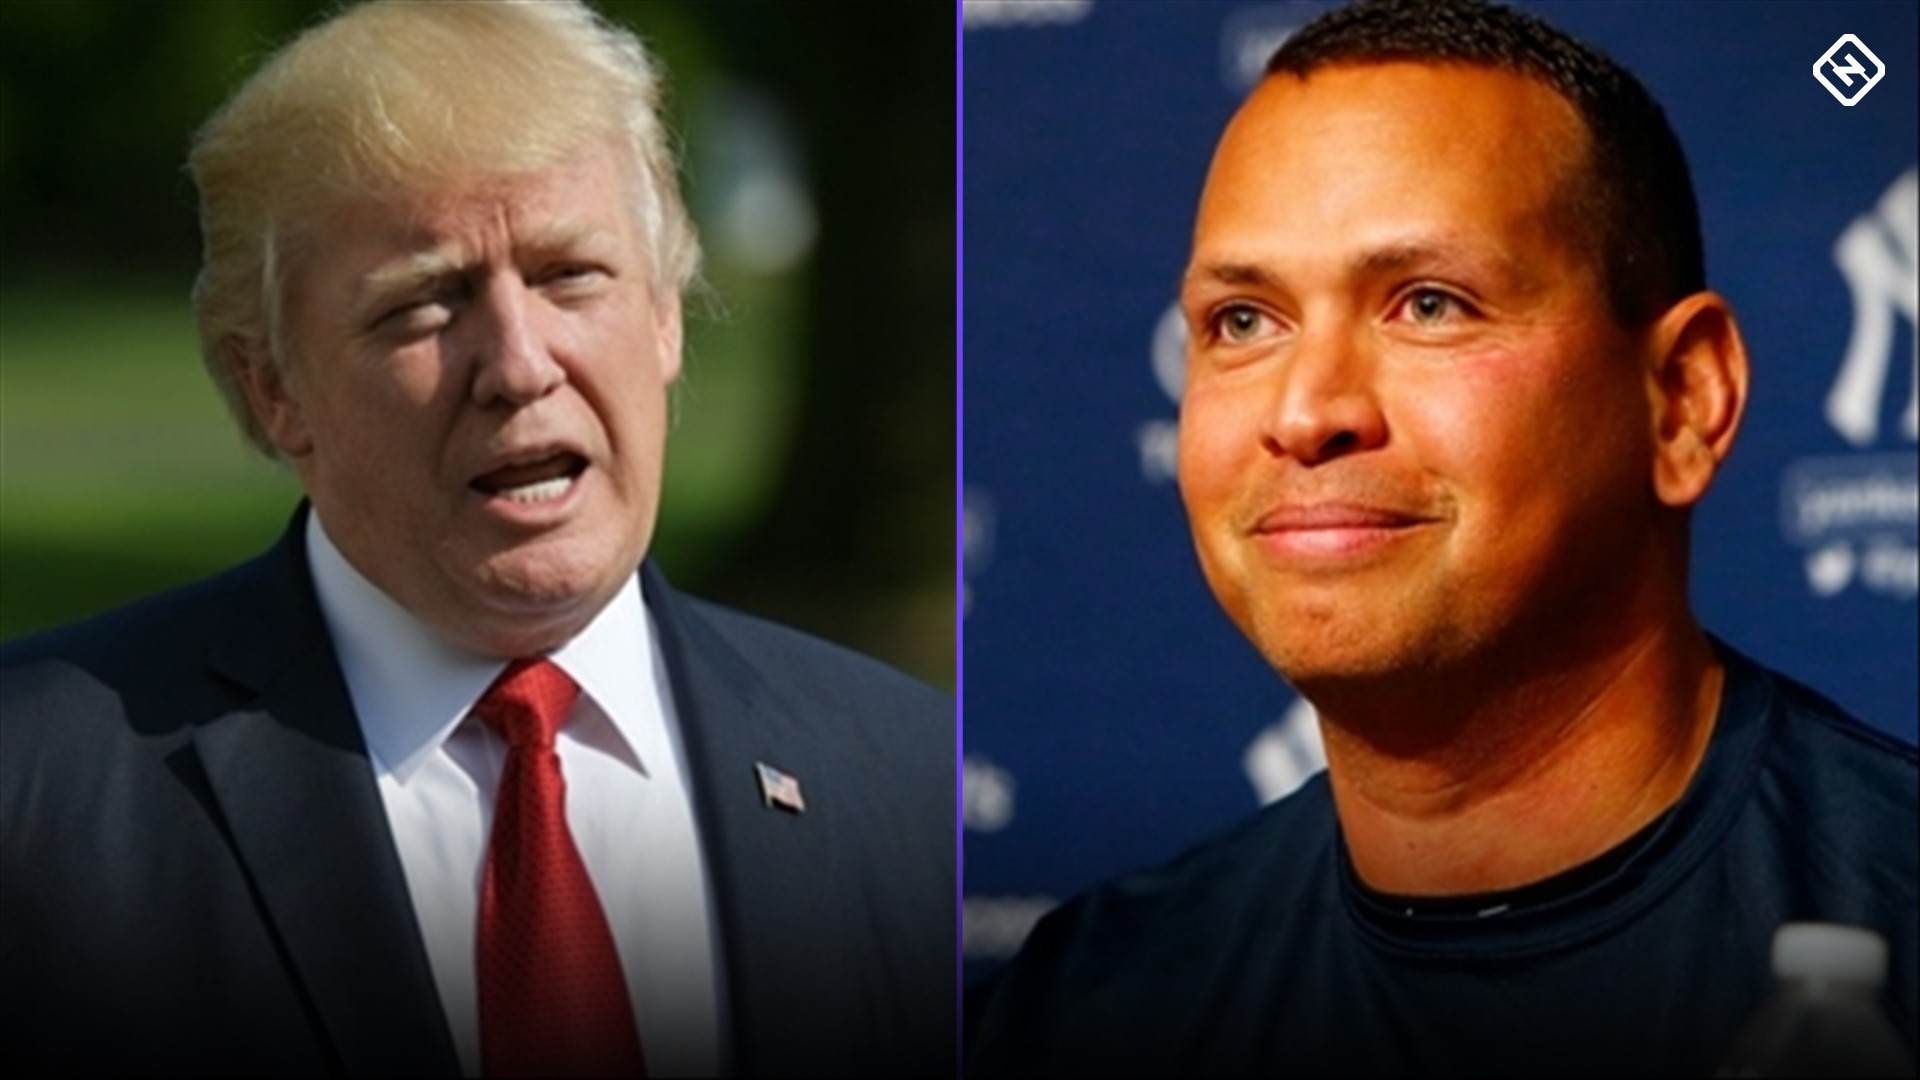 Donald Trump le pidió consejo a Alex Rodríguez sobre la respuesta al coronavirus, según un informe 11